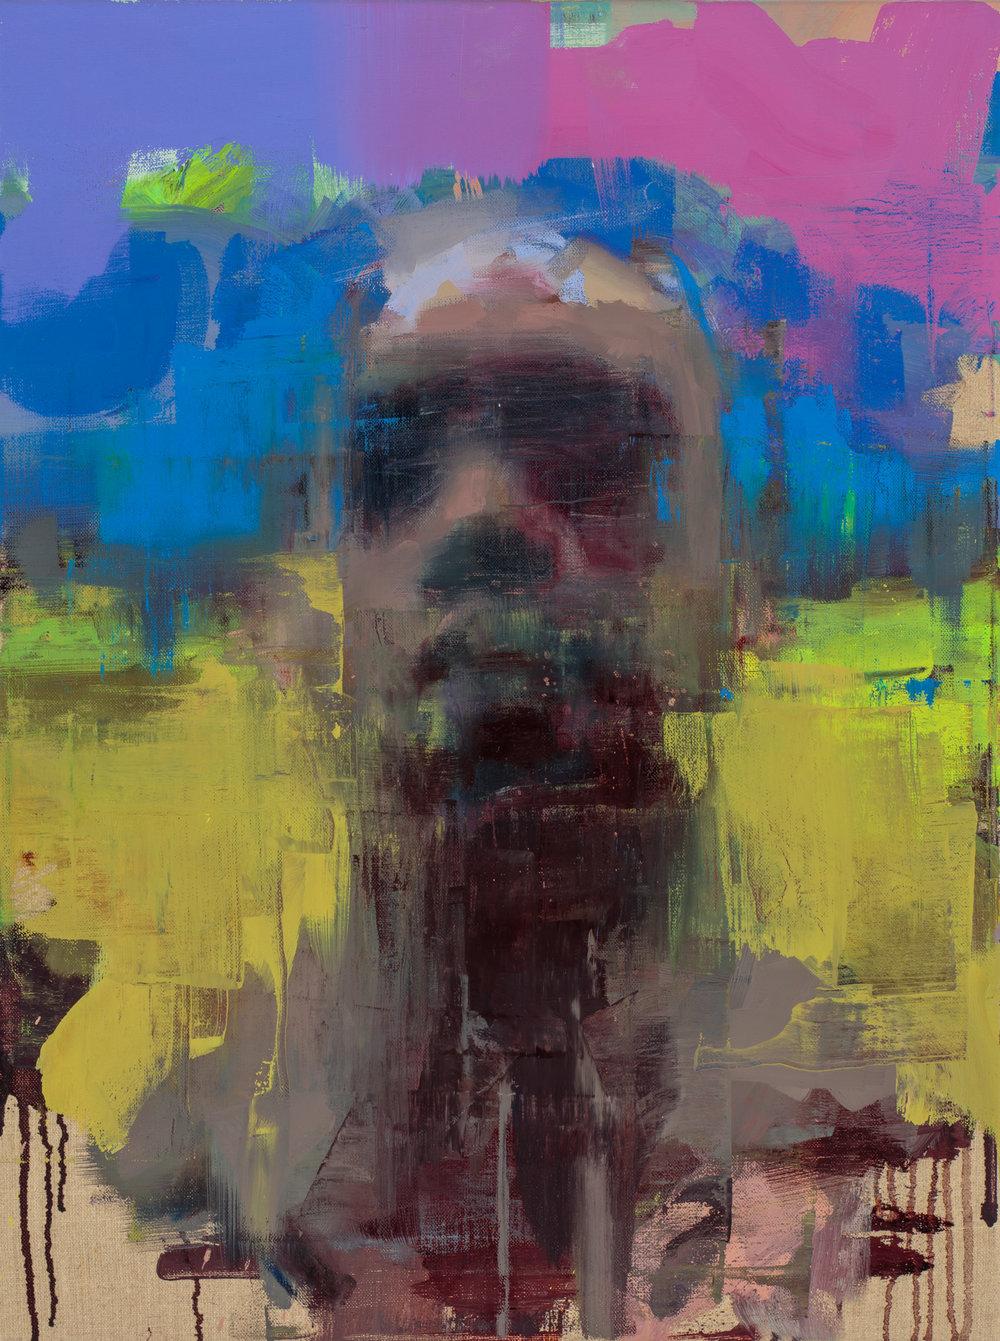 """ Untitled""  2017, 16"" x 24"" (40 x 60 cm), oil on linen."